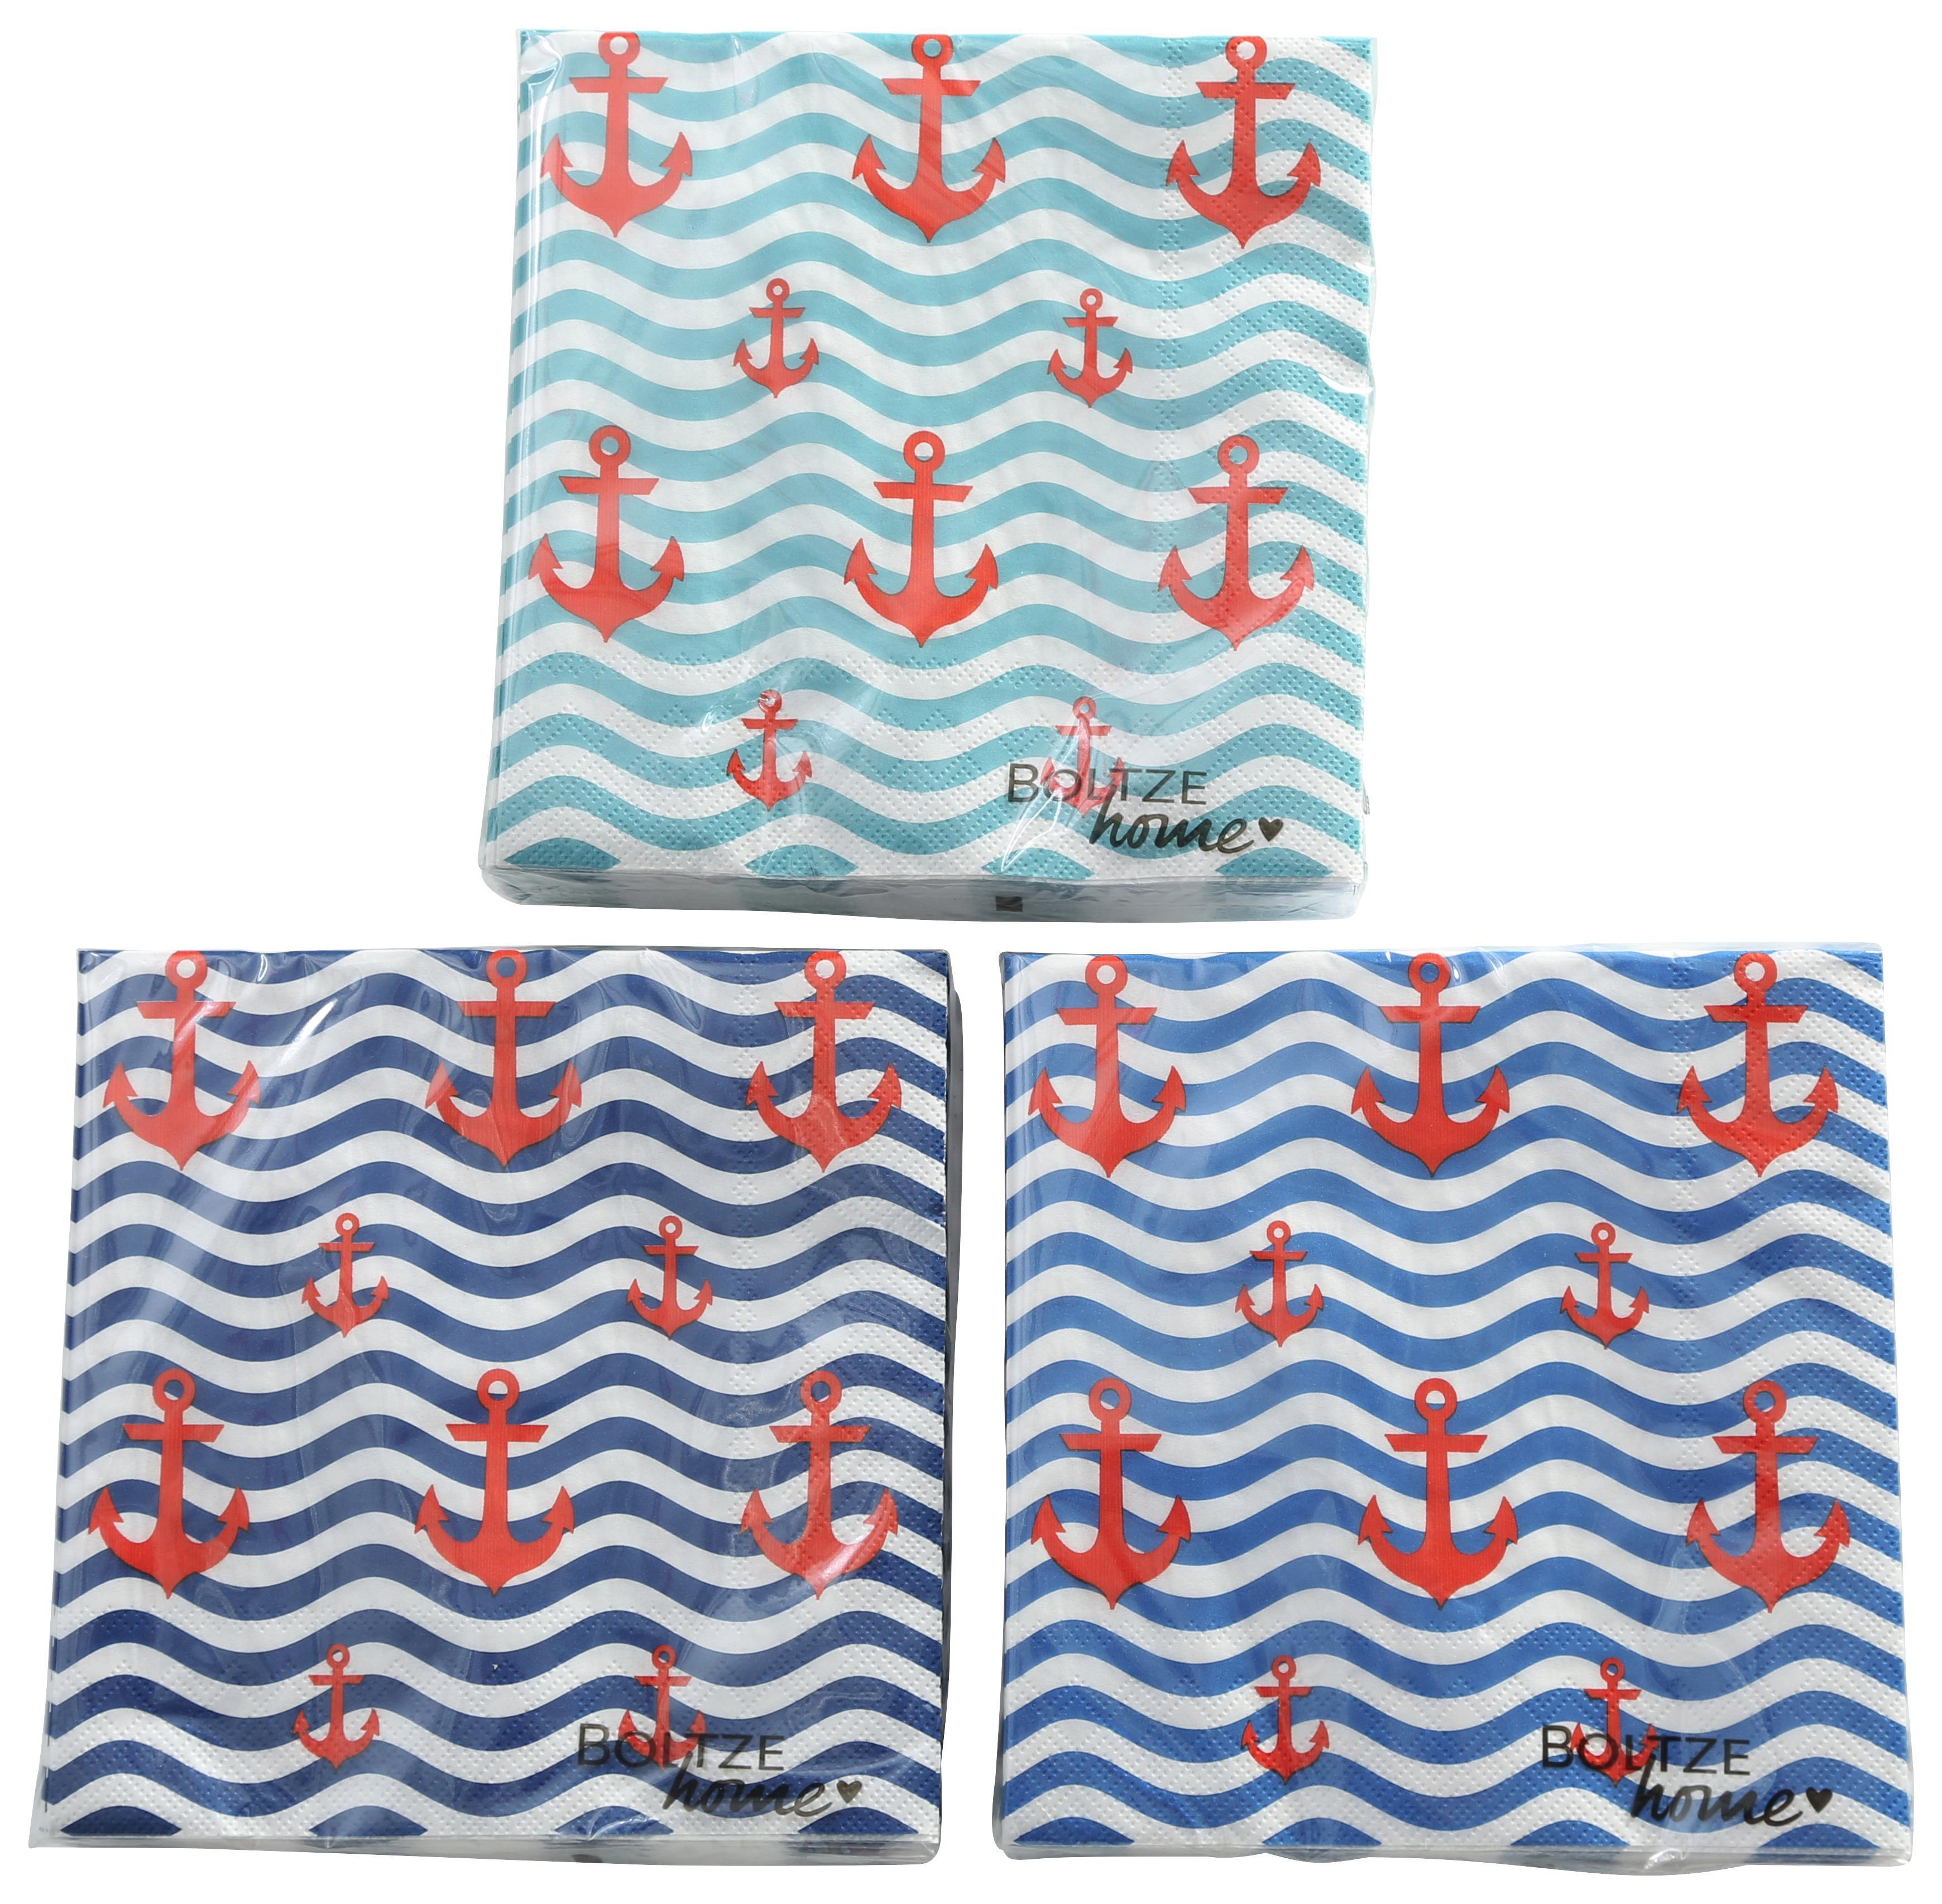 60 x Paper Design Servietten Papierservietten blau Weiß Anker Maritime Meer